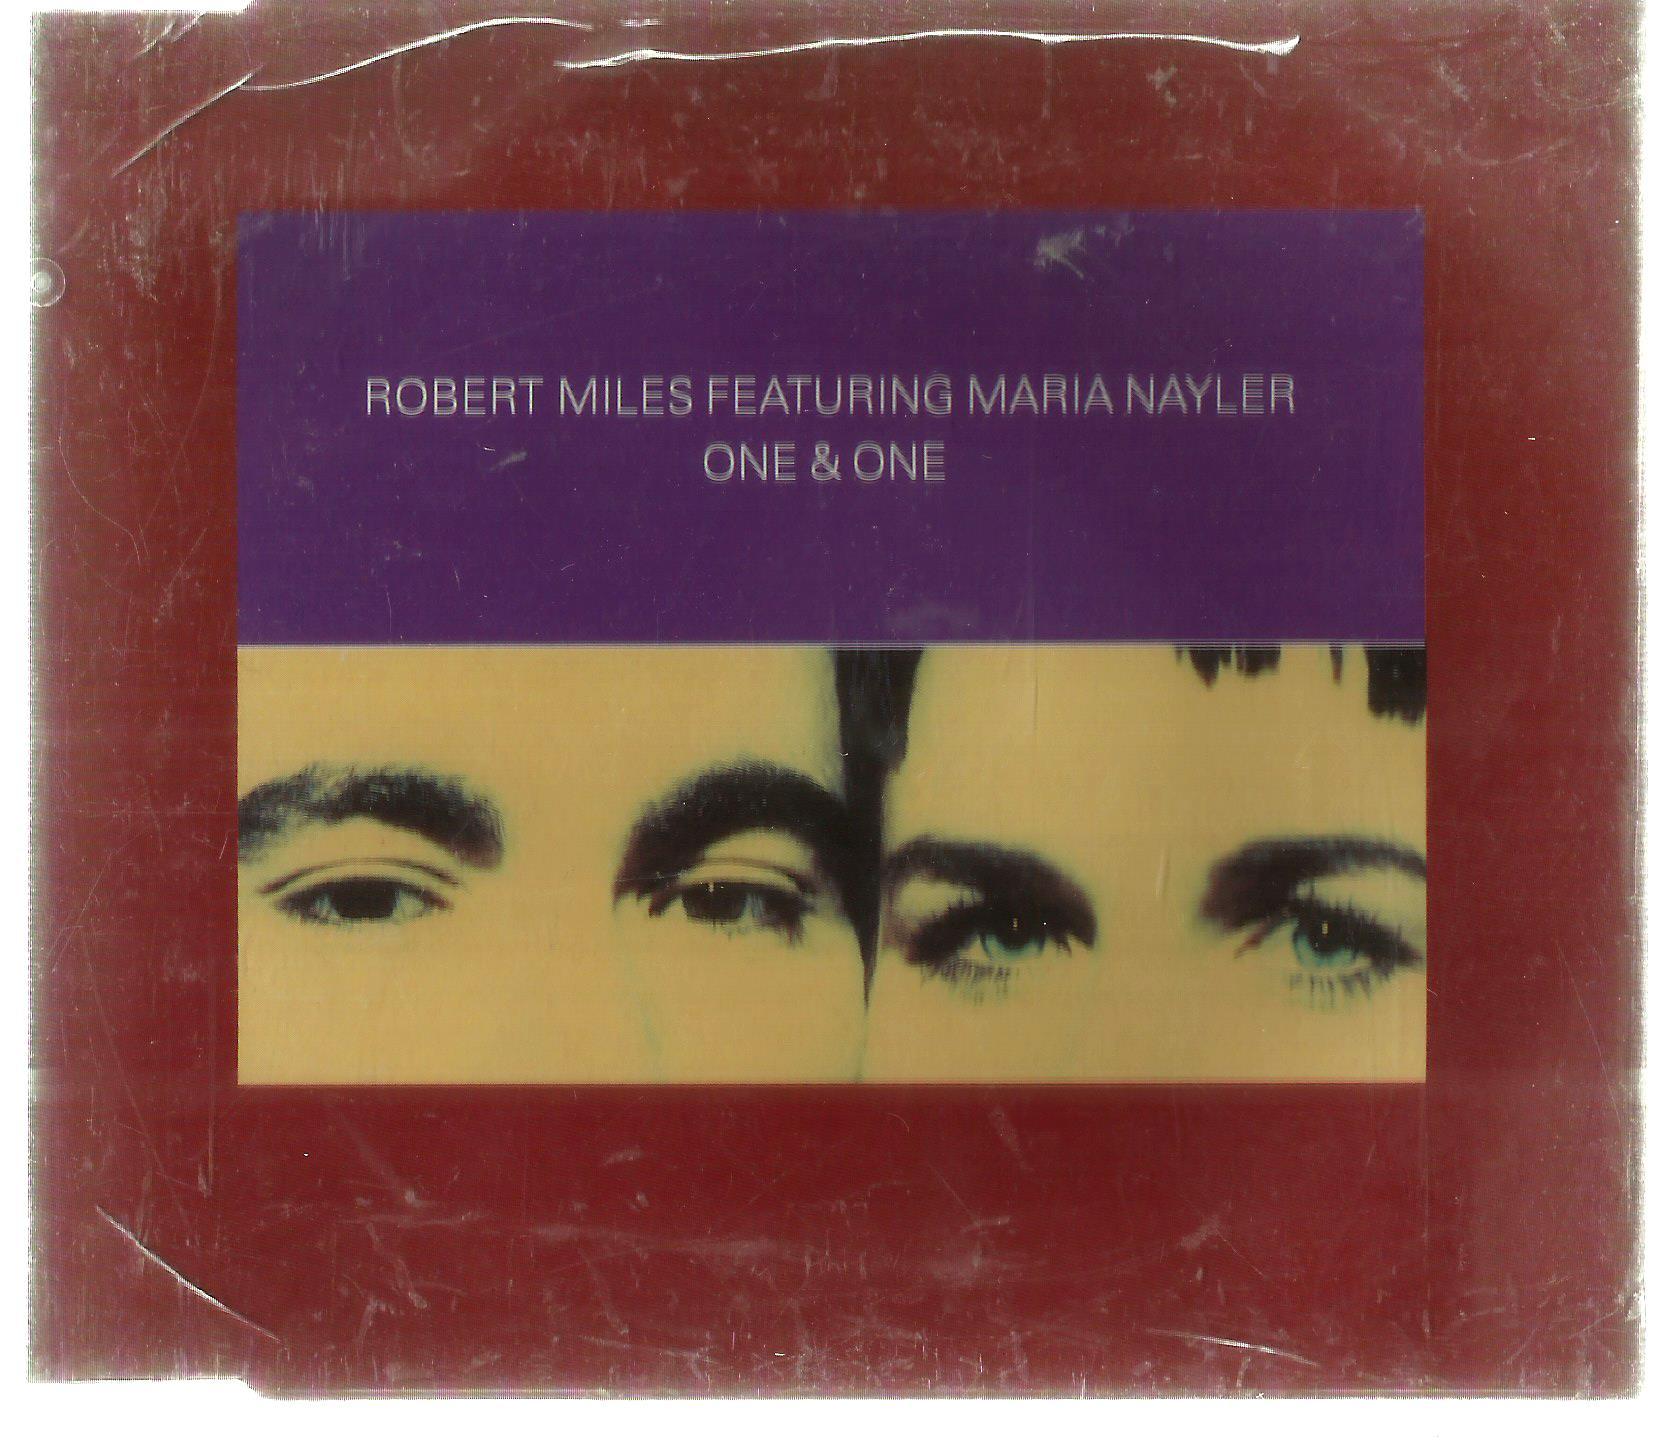 ROBERT MILES ONE & ONE CD1 SINGIEL 1996